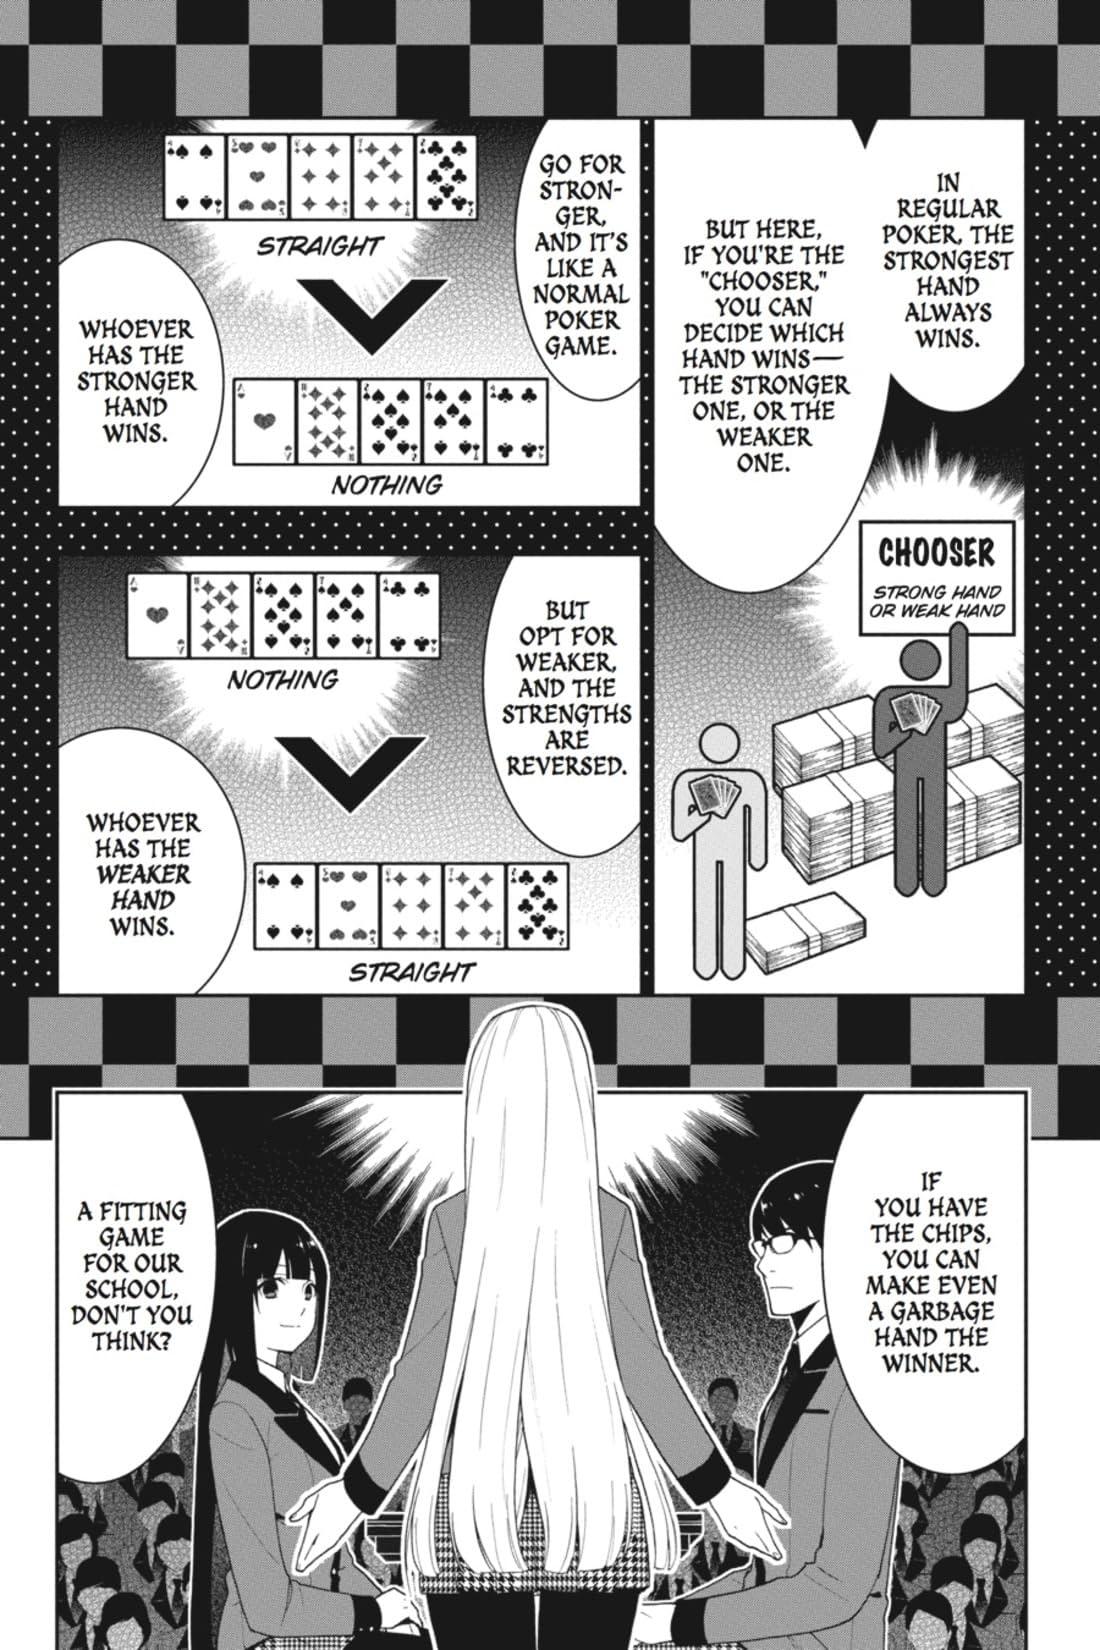 Kakegurui - Compulsive Gambler #23